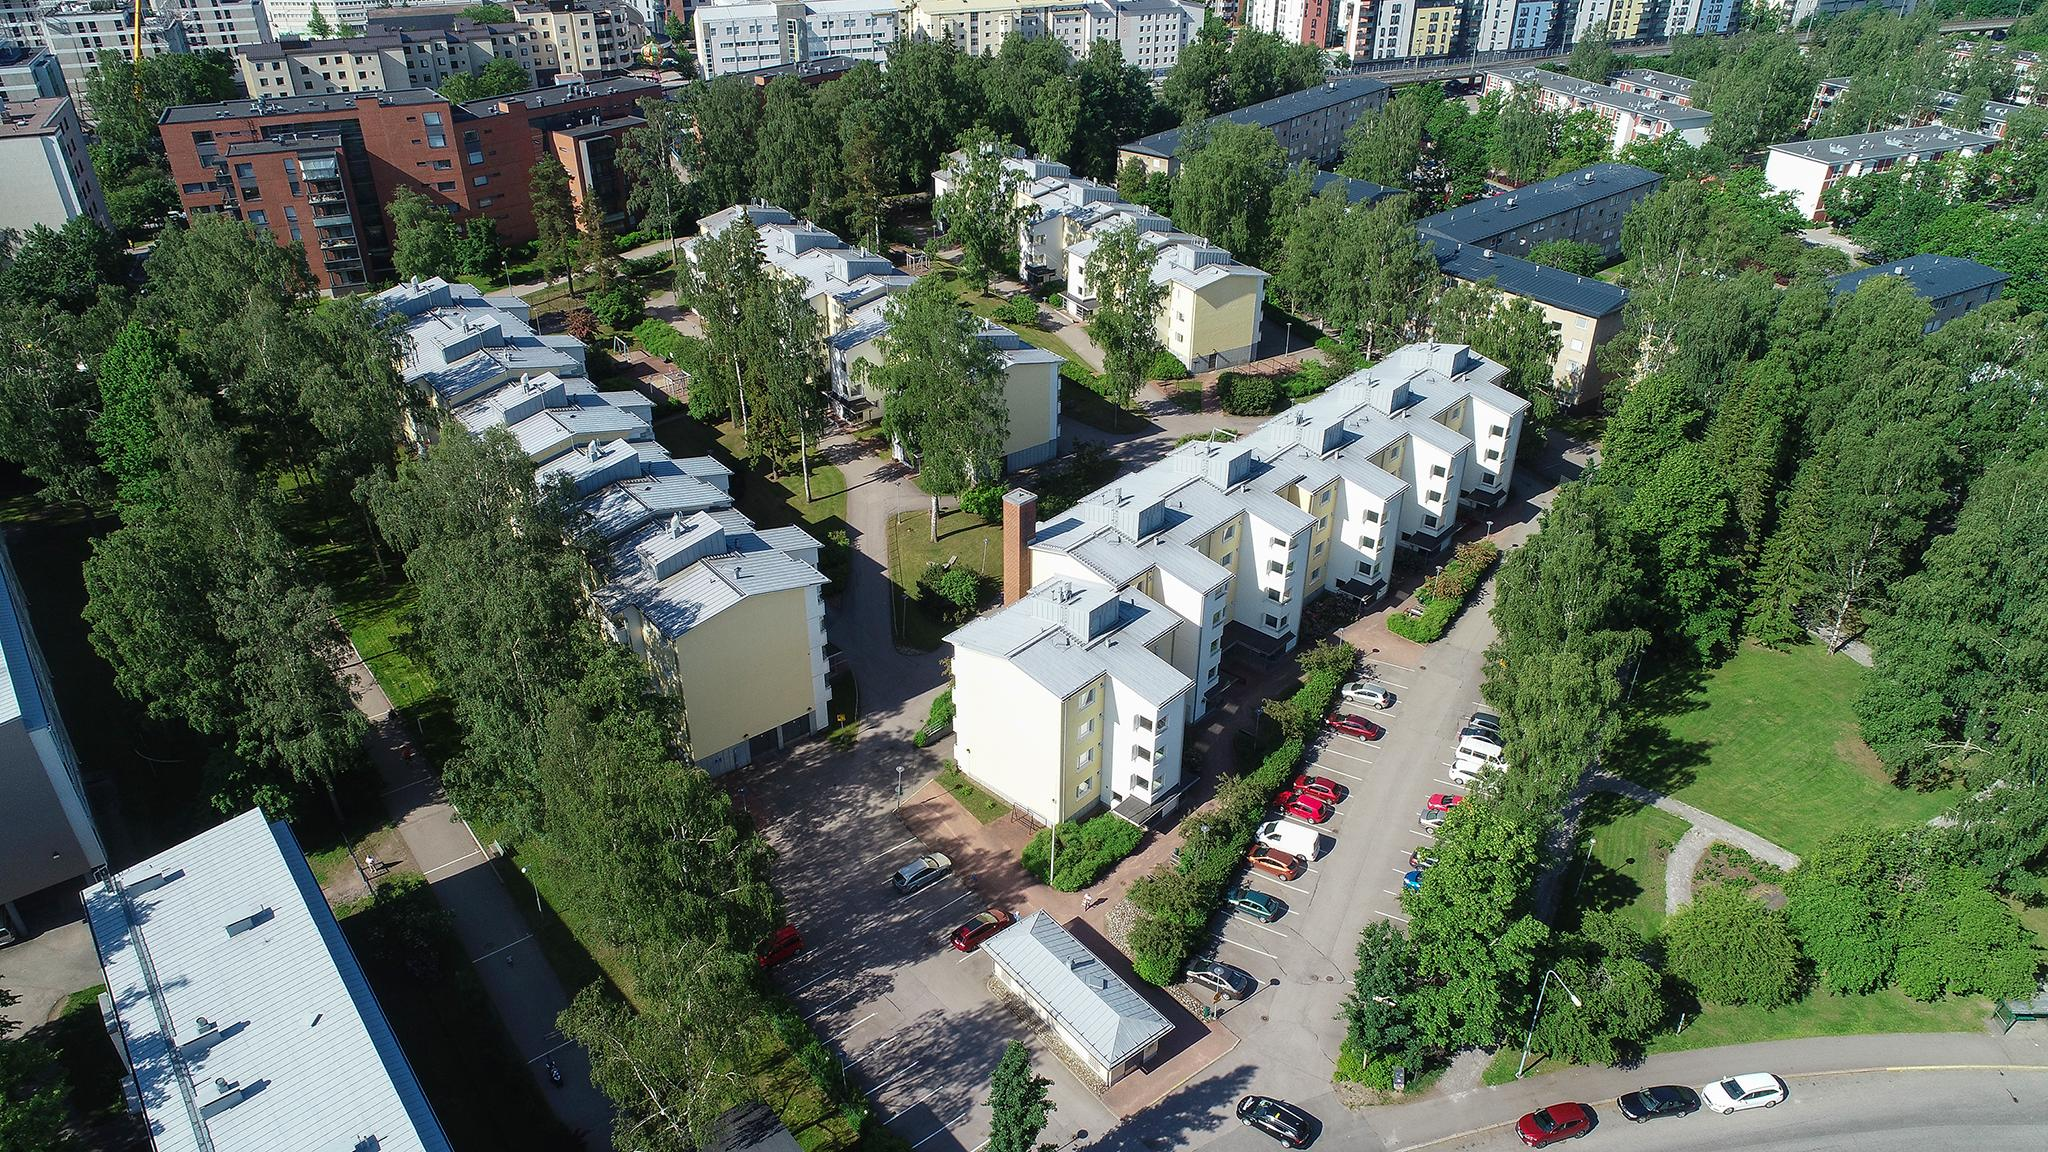 Valokuvaaja Timo Ahola - Drone-ilmakuvaus - Helsinki Kannelmäki (c) Valokuvaaja Timo Ahola